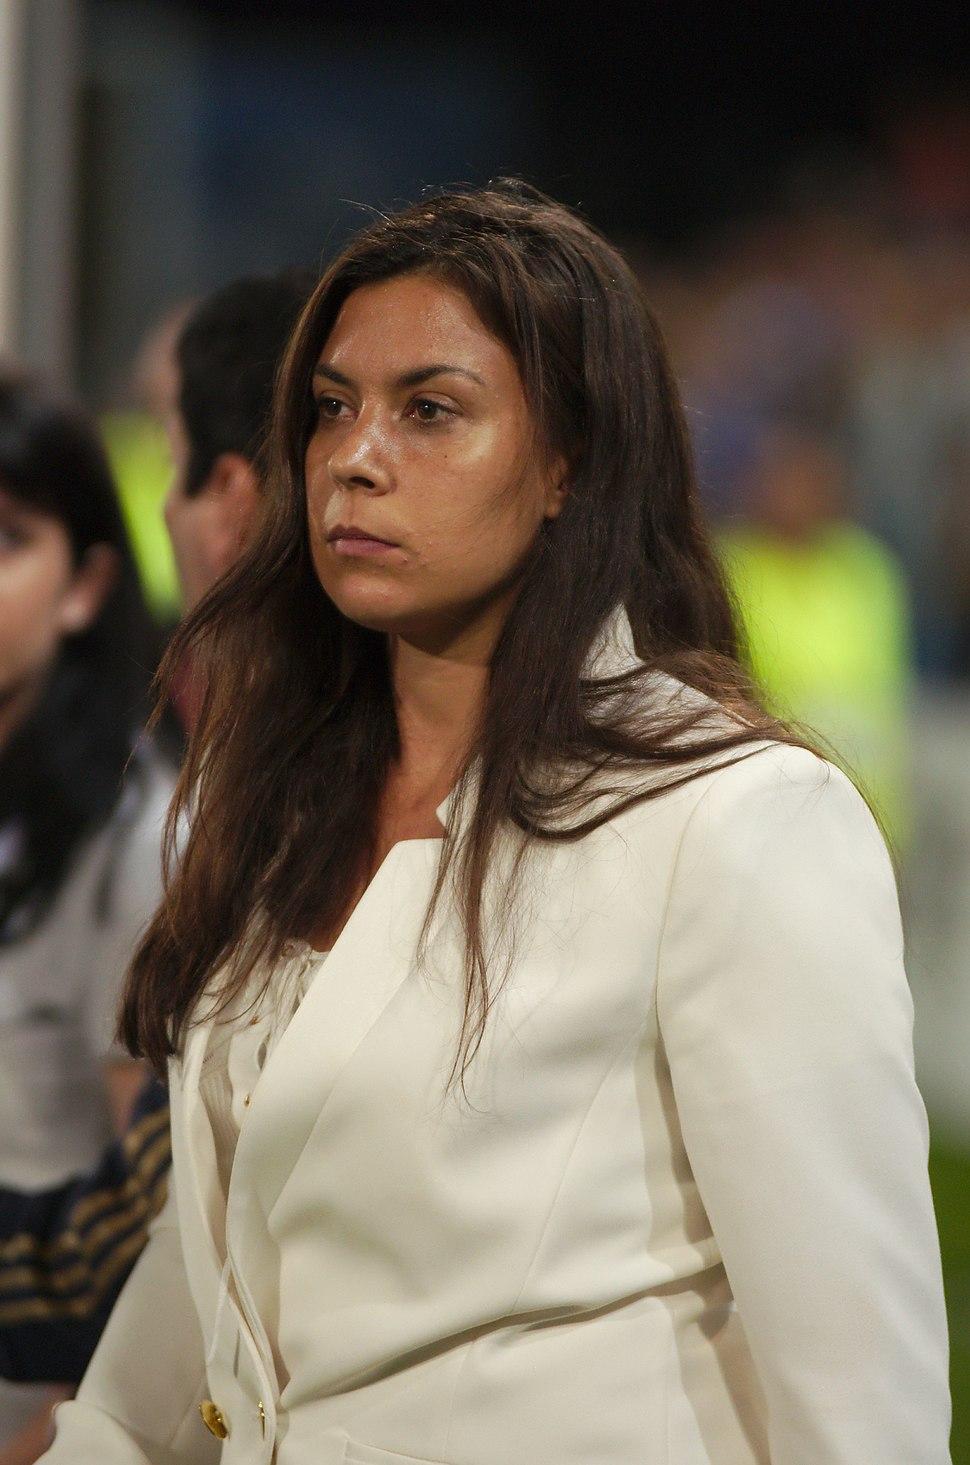 Valais Cup 2013 - OM-FC Porto 13-07-2013 - Marion Bartoli